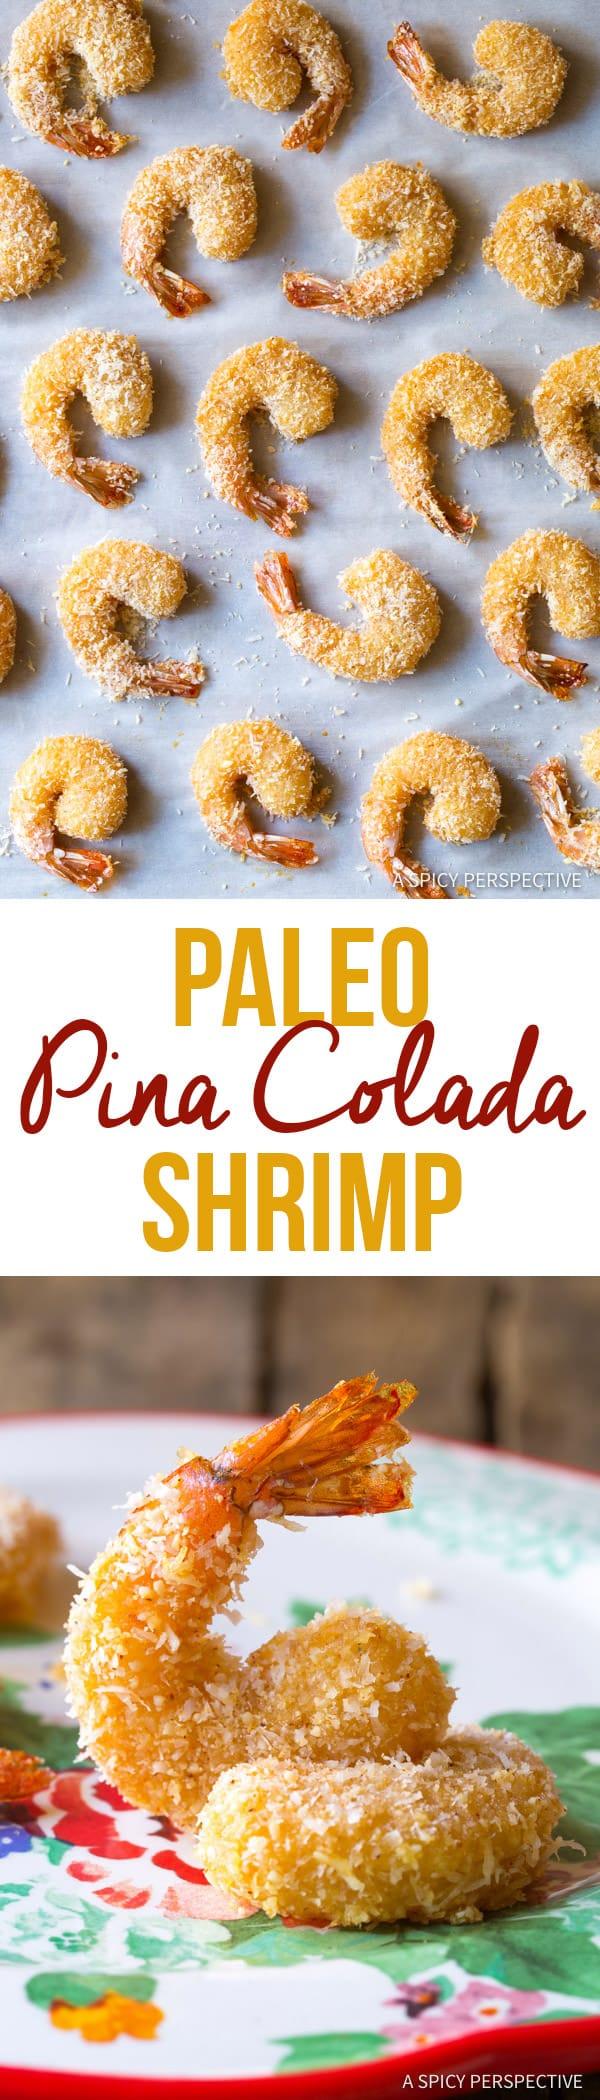 Healthy Paleo Coconut Shrimp Recipe (Pina Colada Shrimp & Gluten Free!) | ASpicyPerspective.com